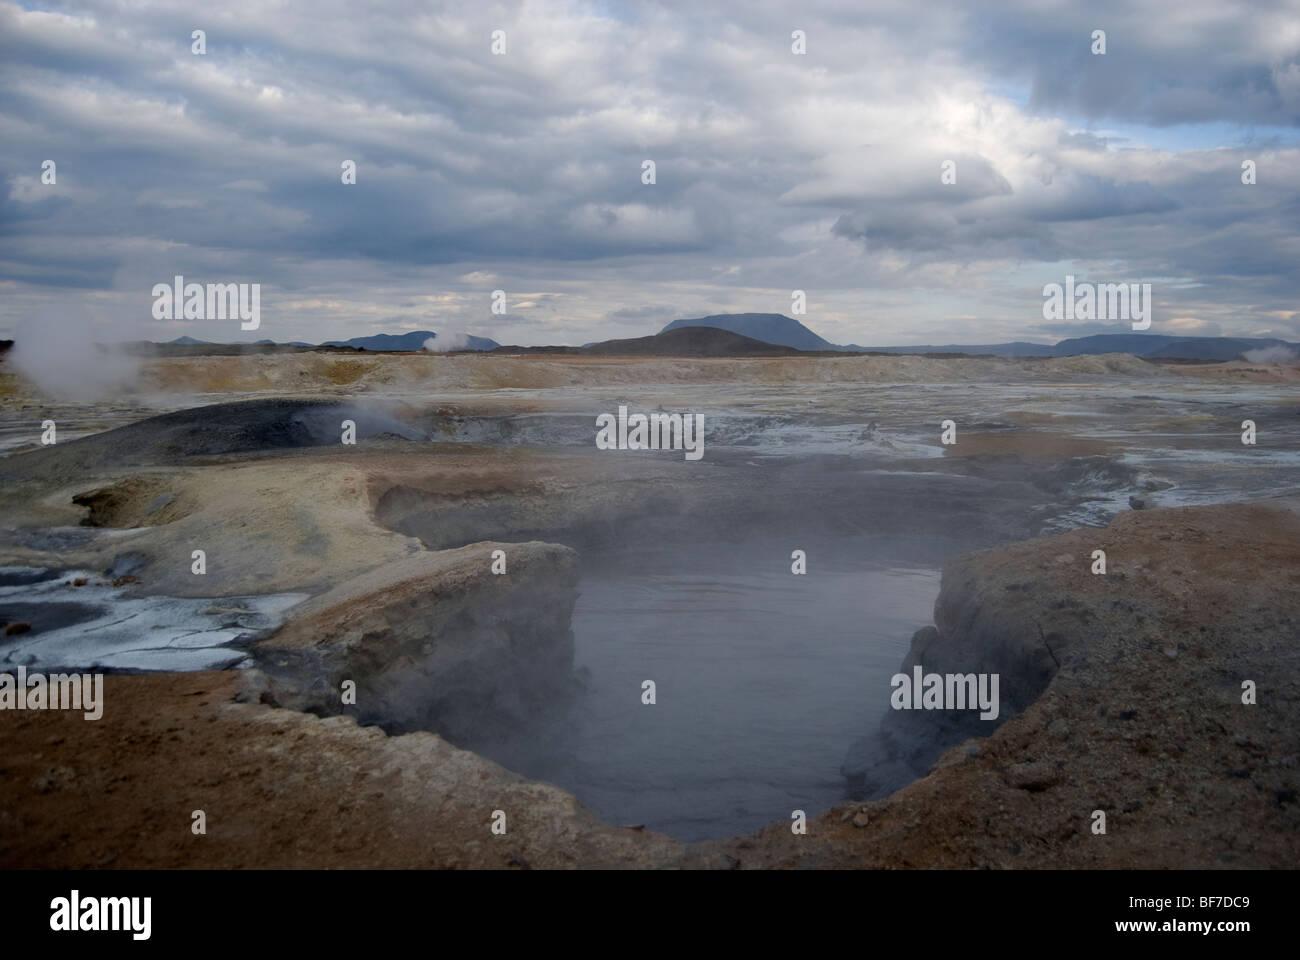 Sulfurous fumaroles at Námafjall, Iceland - Stock Image